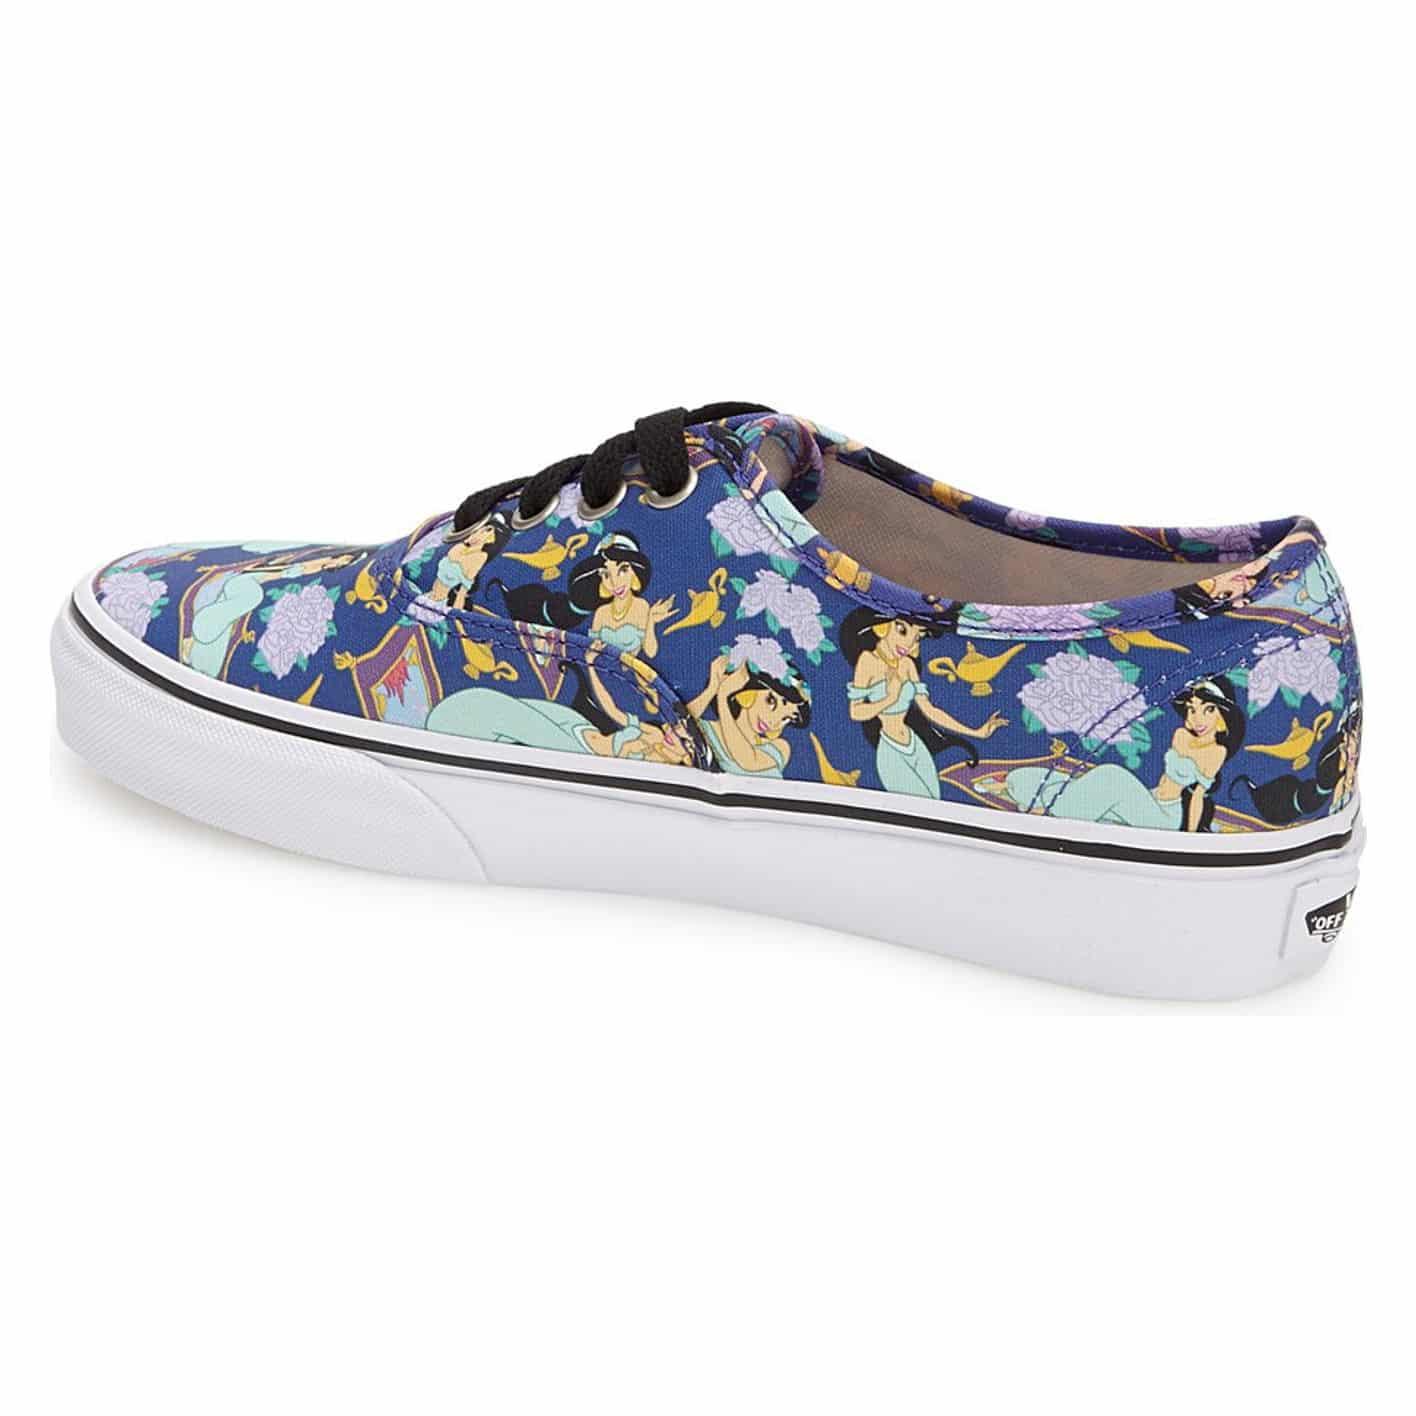 Vans Disney Authentic Princess Jasmine Shoe Deep Ultramarine